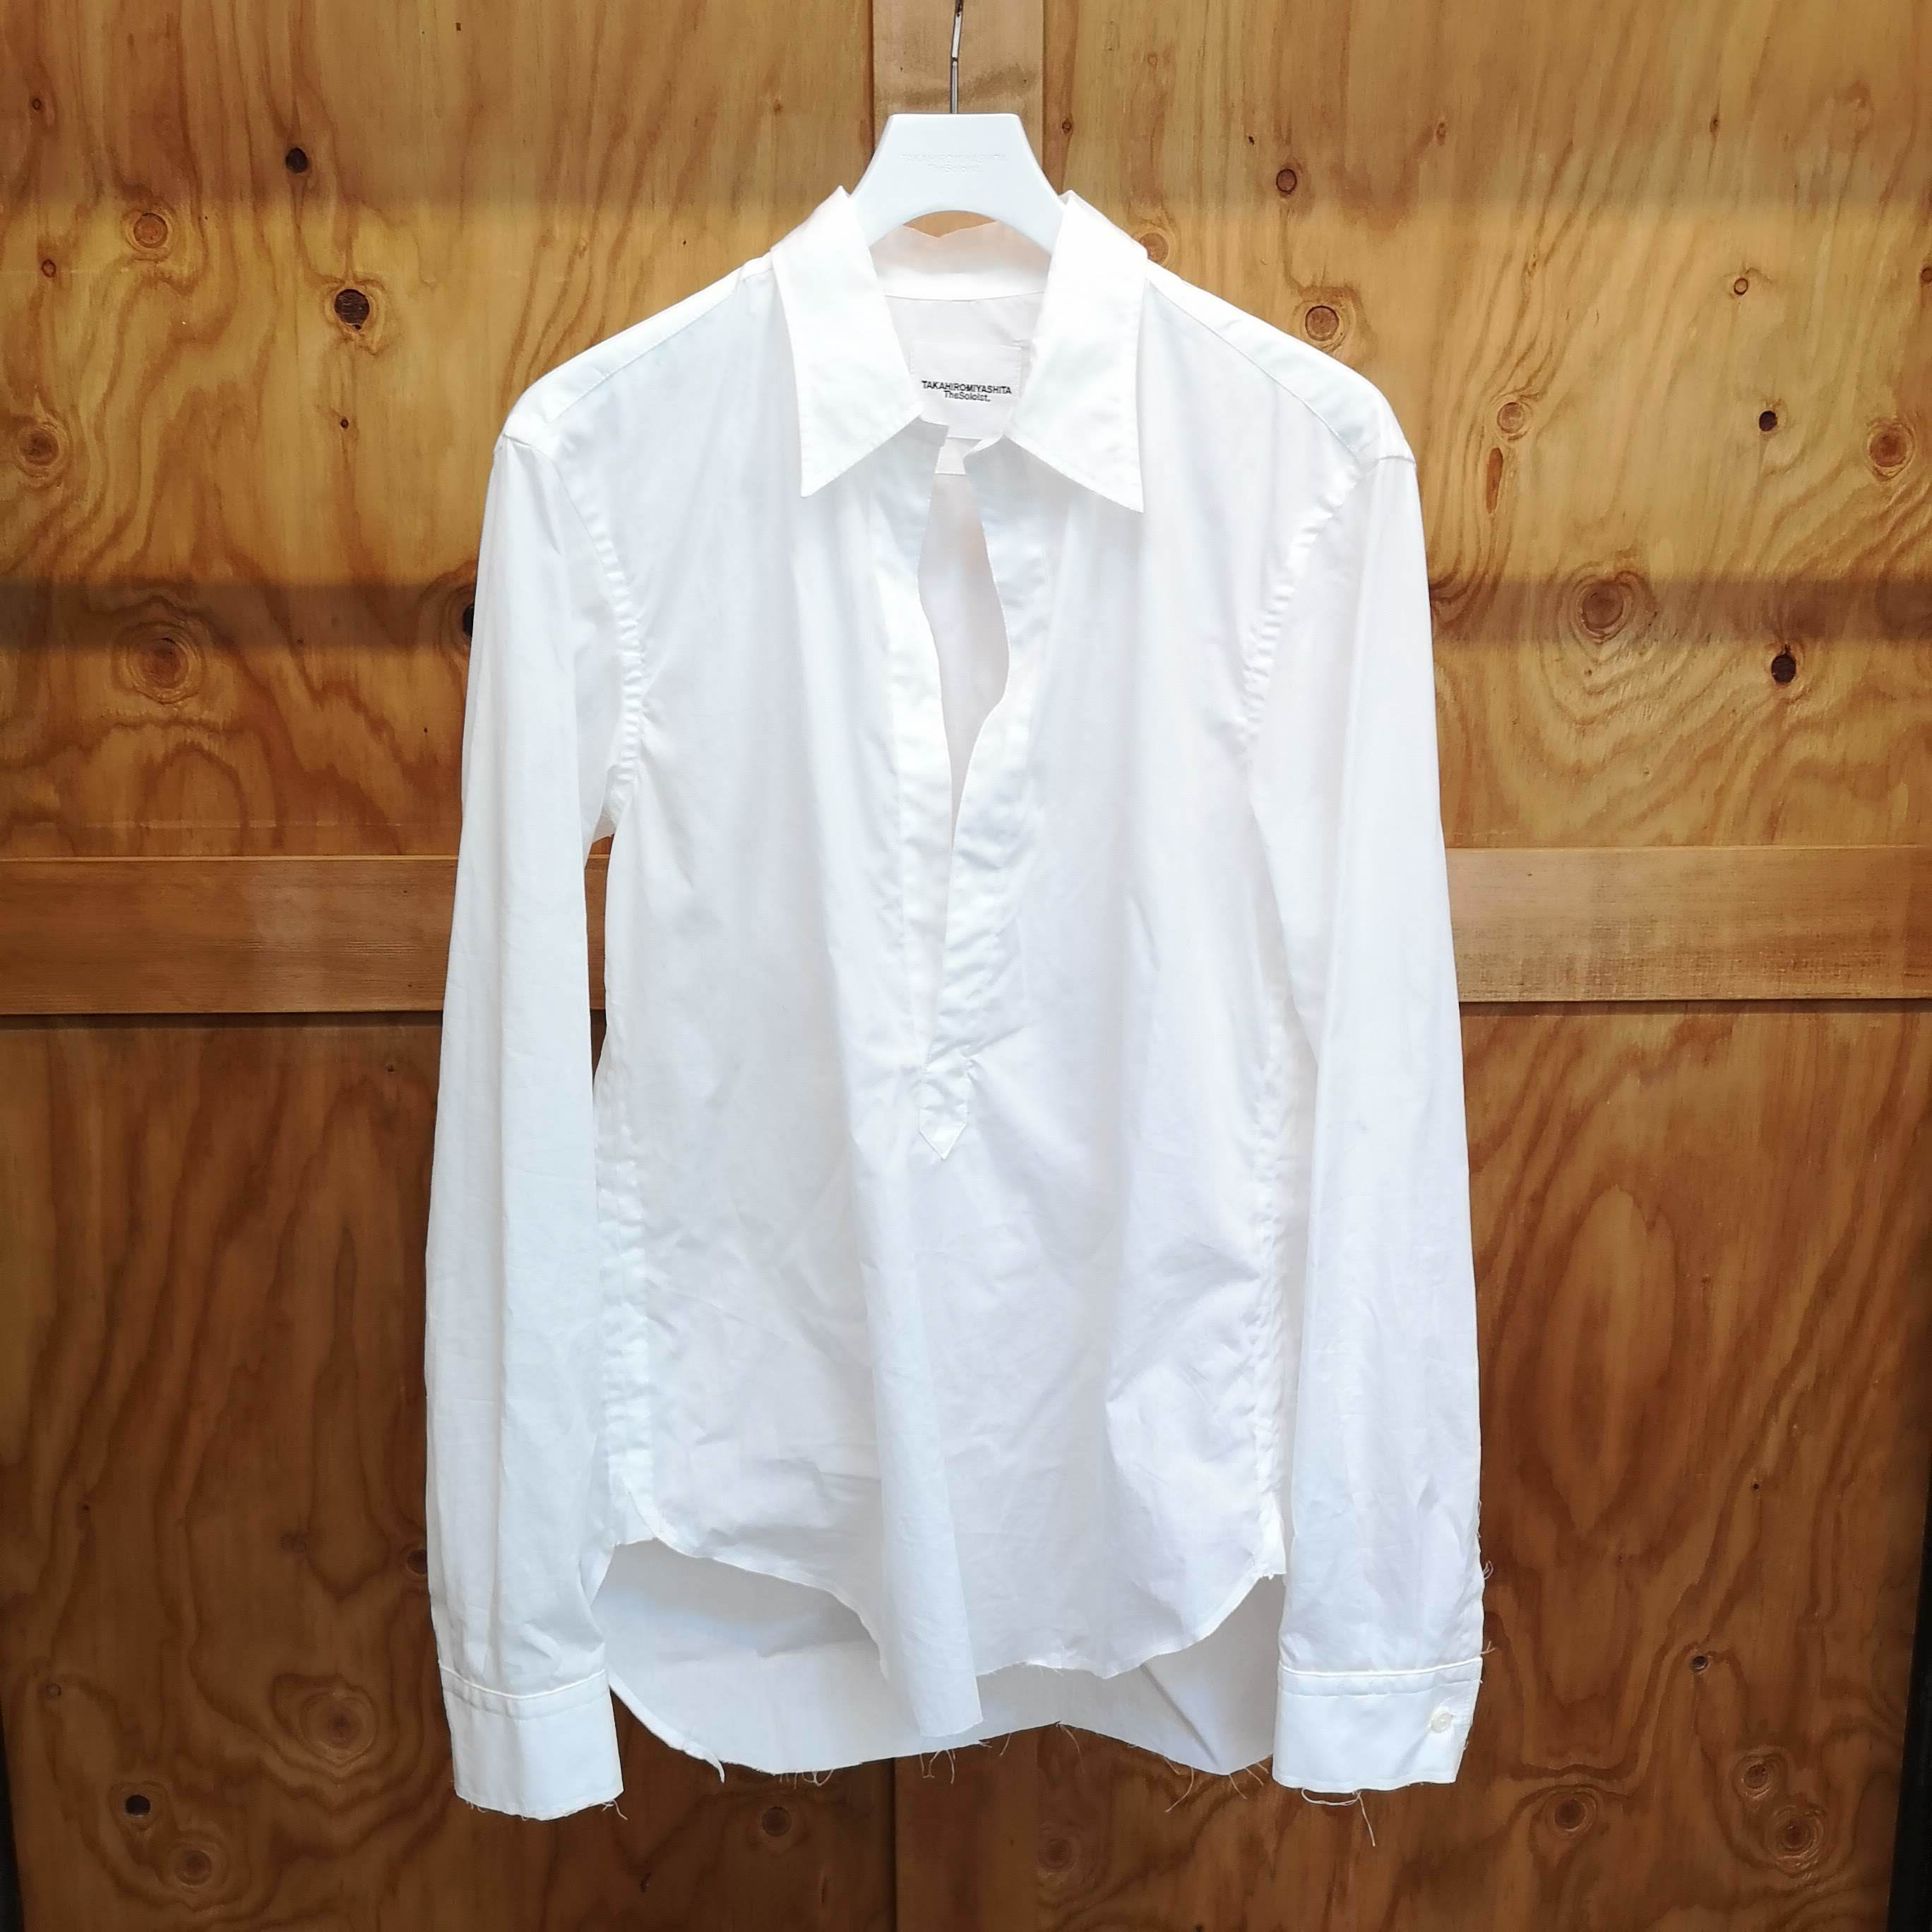 sws.0003AW18 : deep neck pullover shirt.